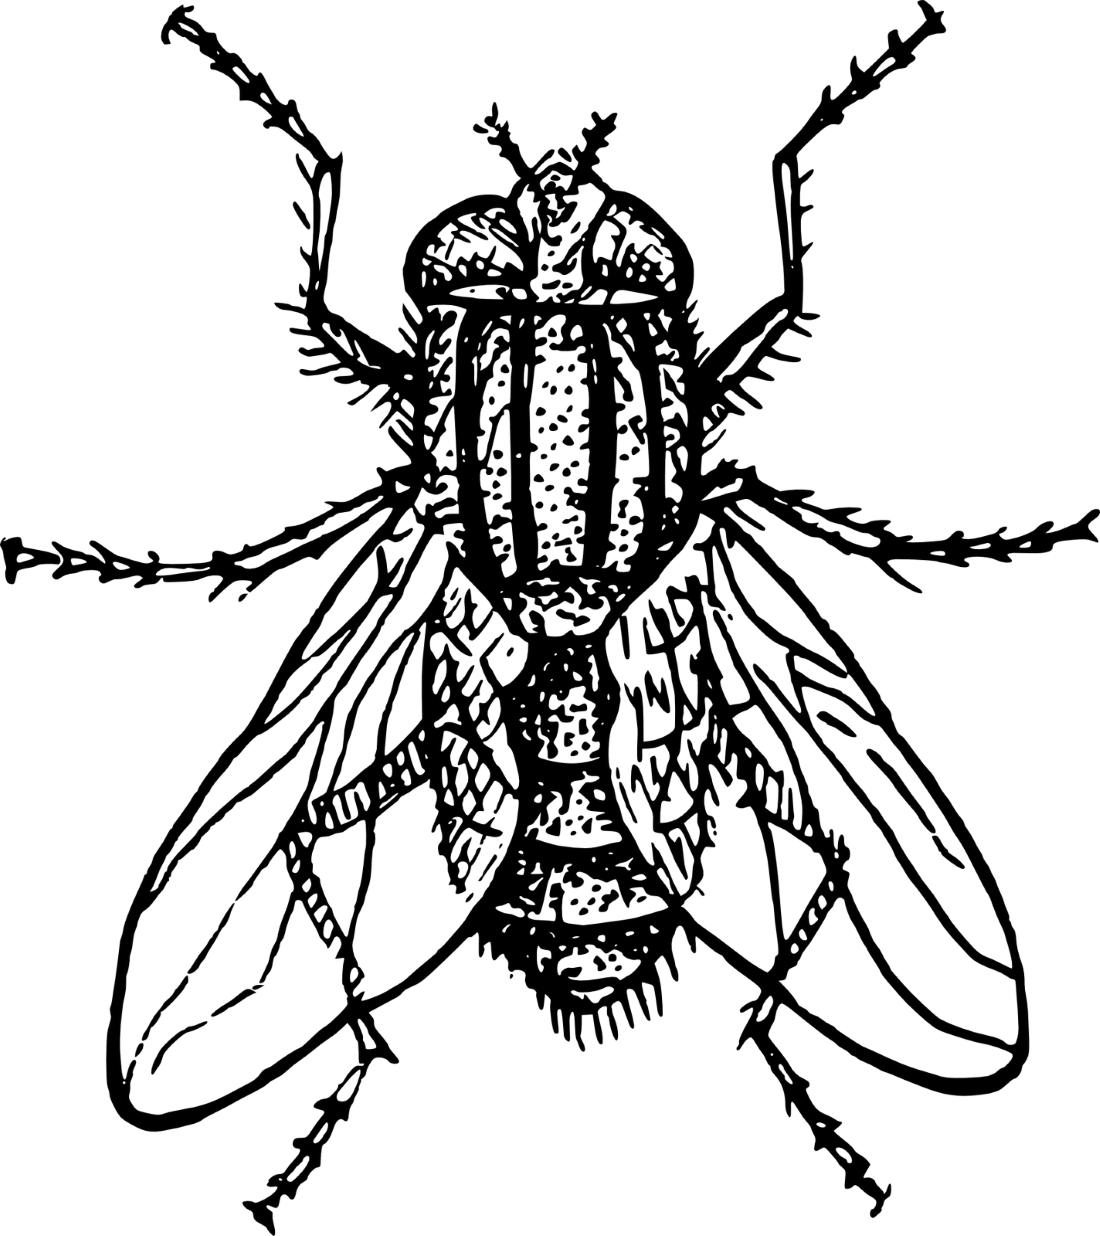 муха как живая раскраска 10915 Printonic Ru